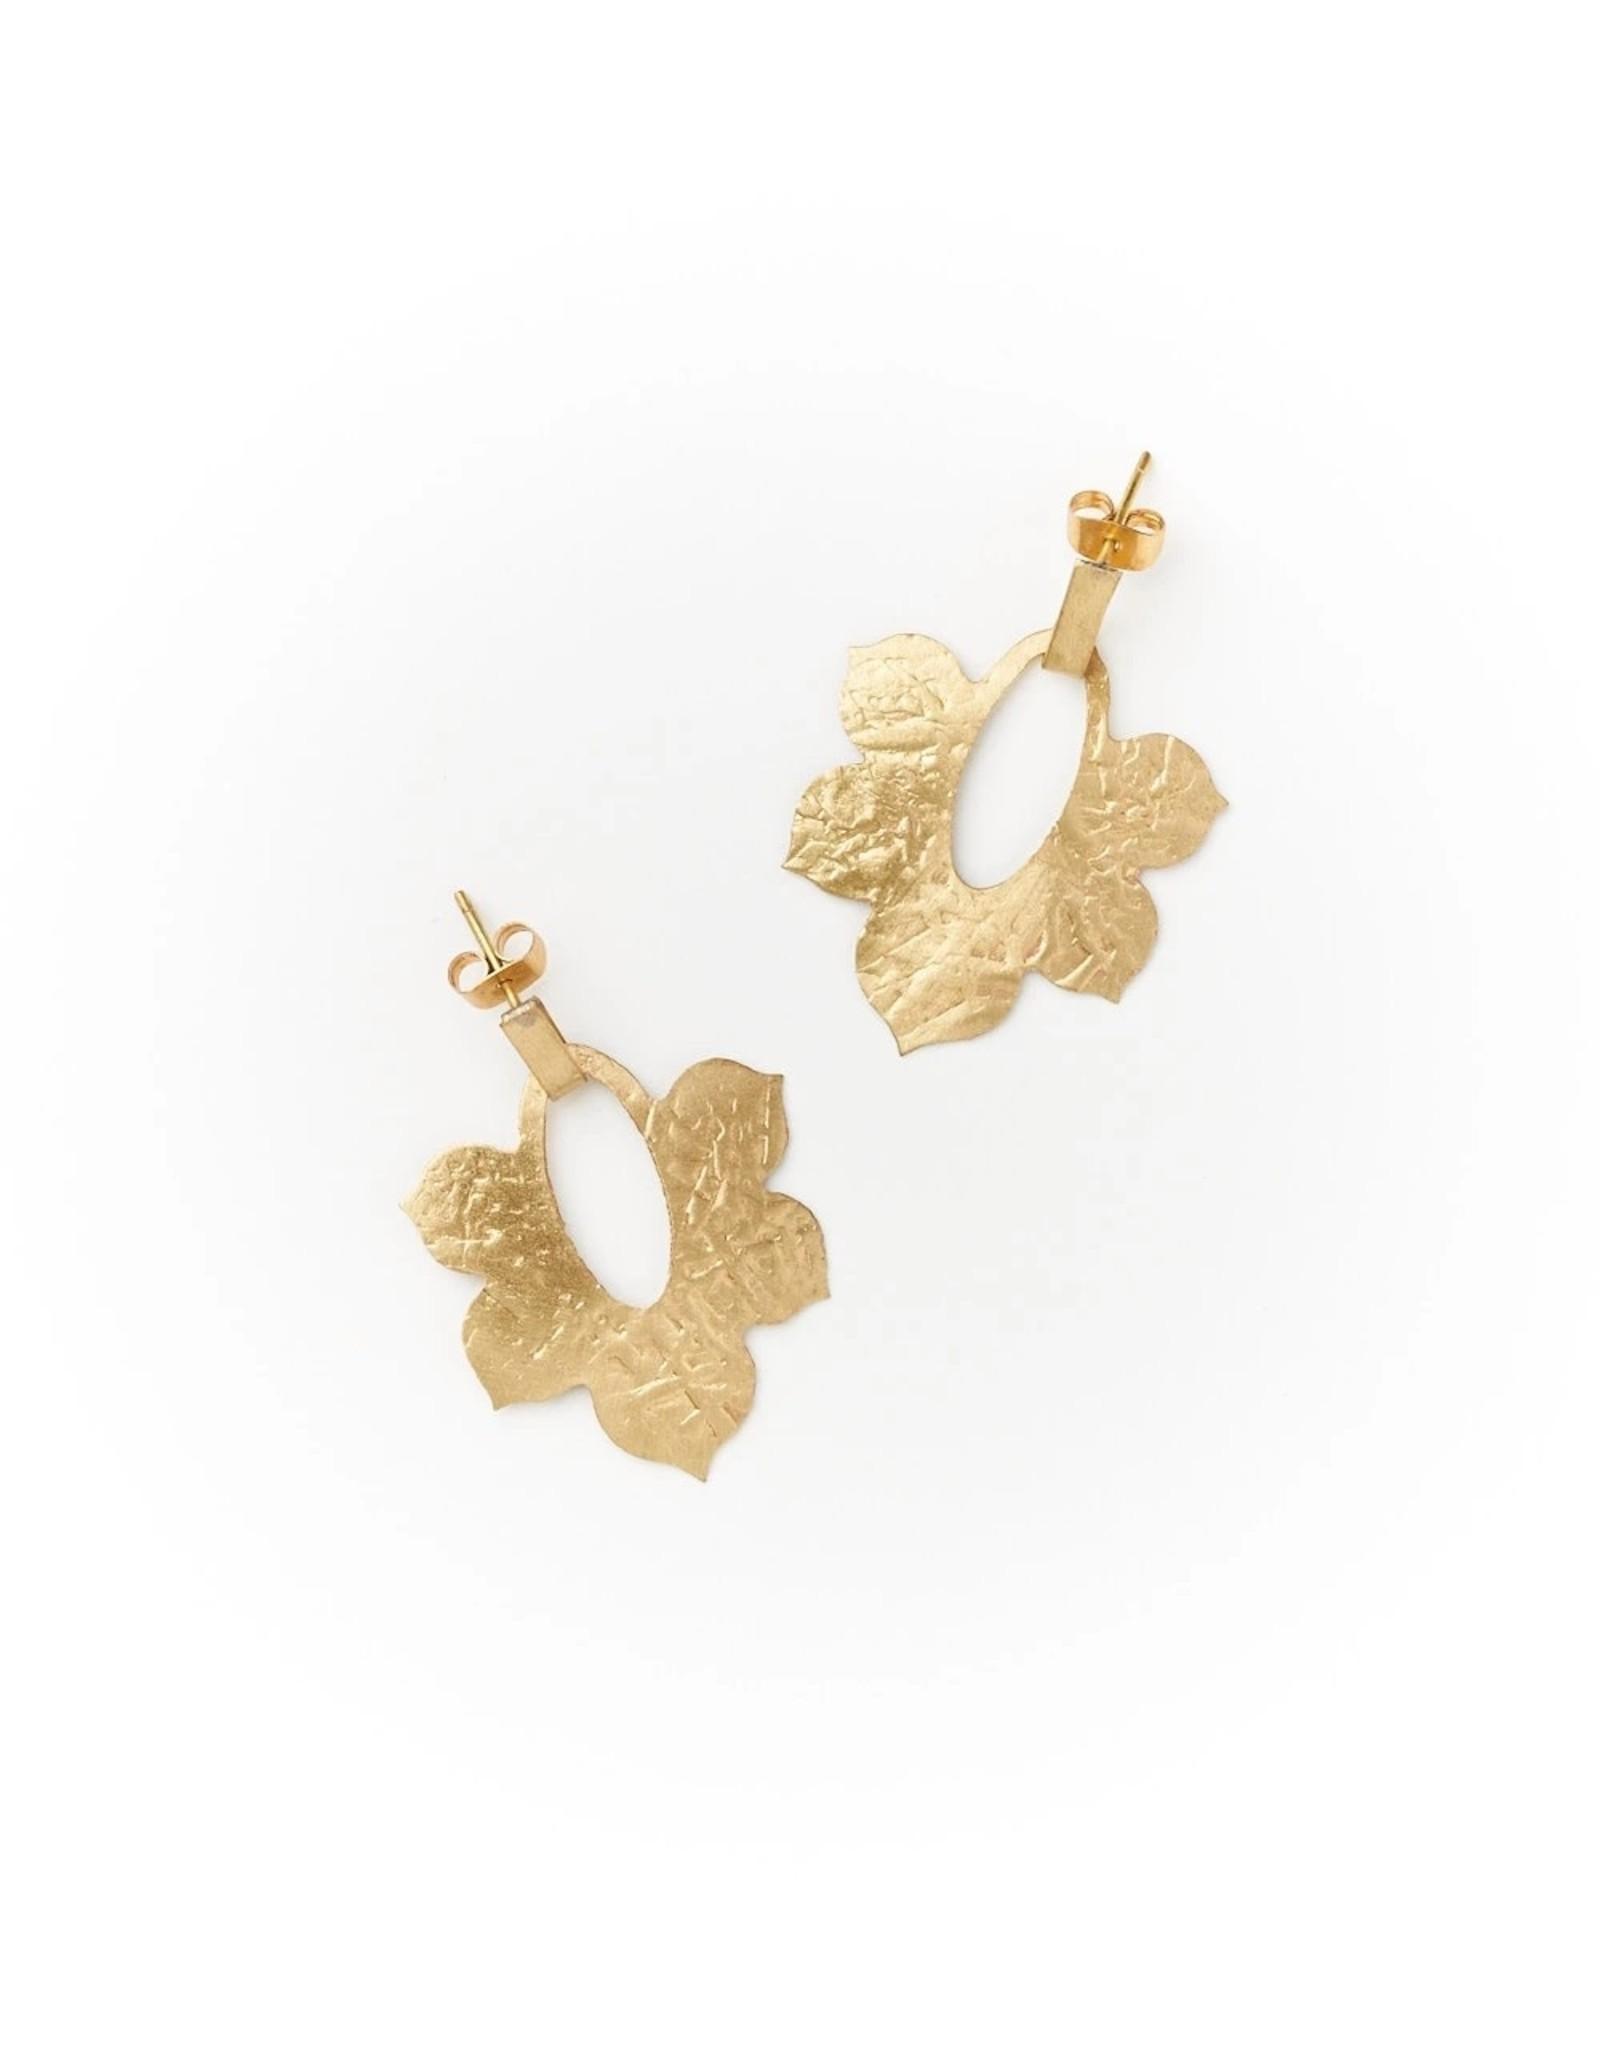 Matr Boomie Kalyani earrings- studs, India